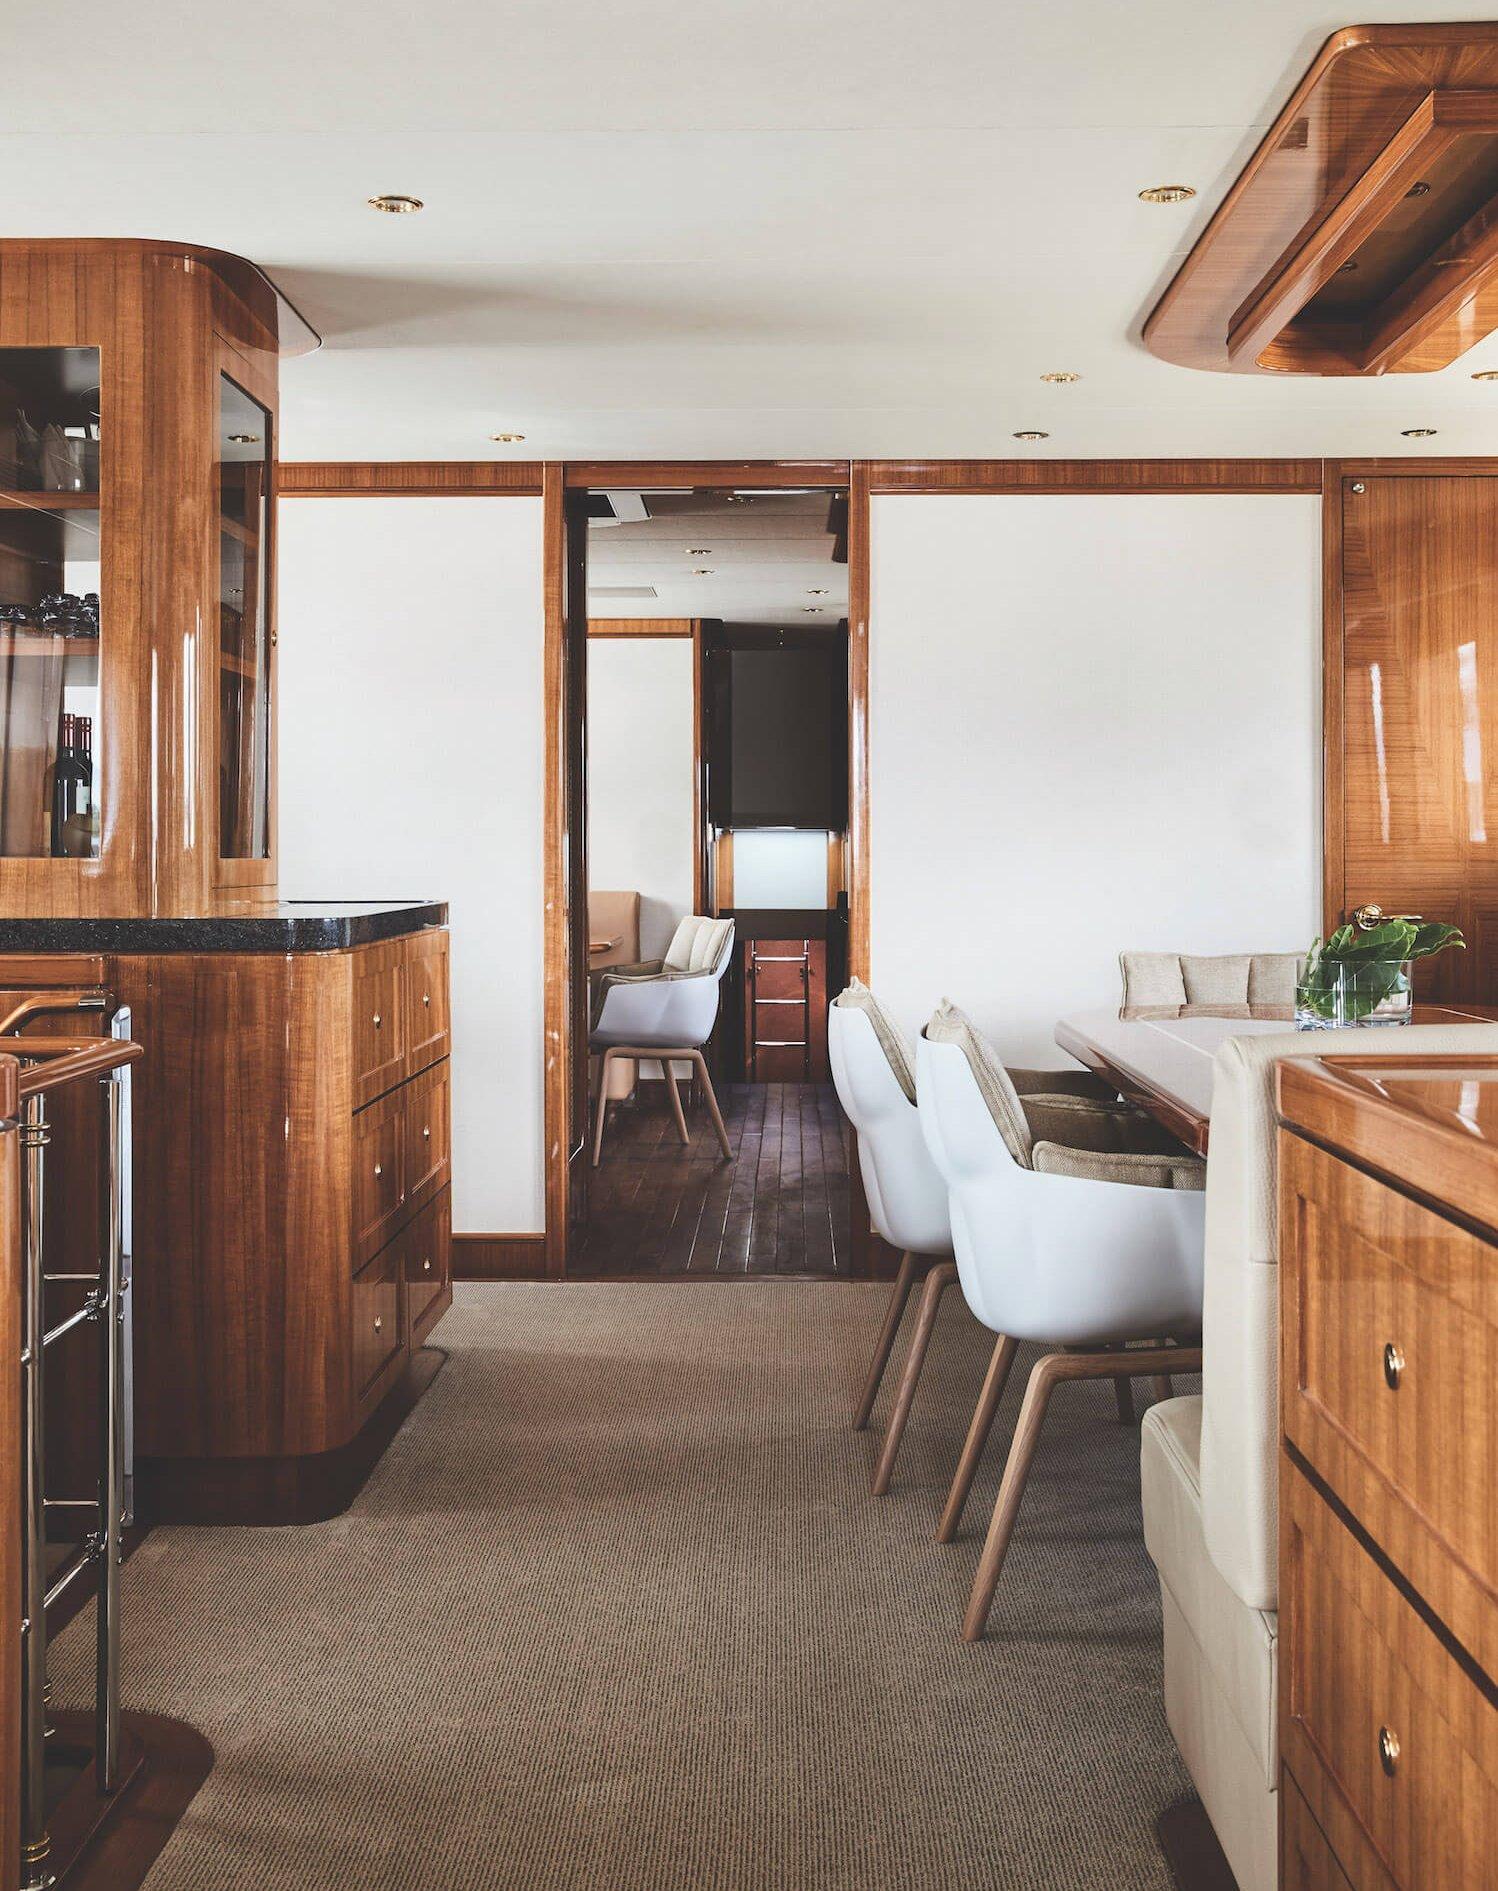 est living architecture robert bruce boat nexus designs 5 e1520555526290